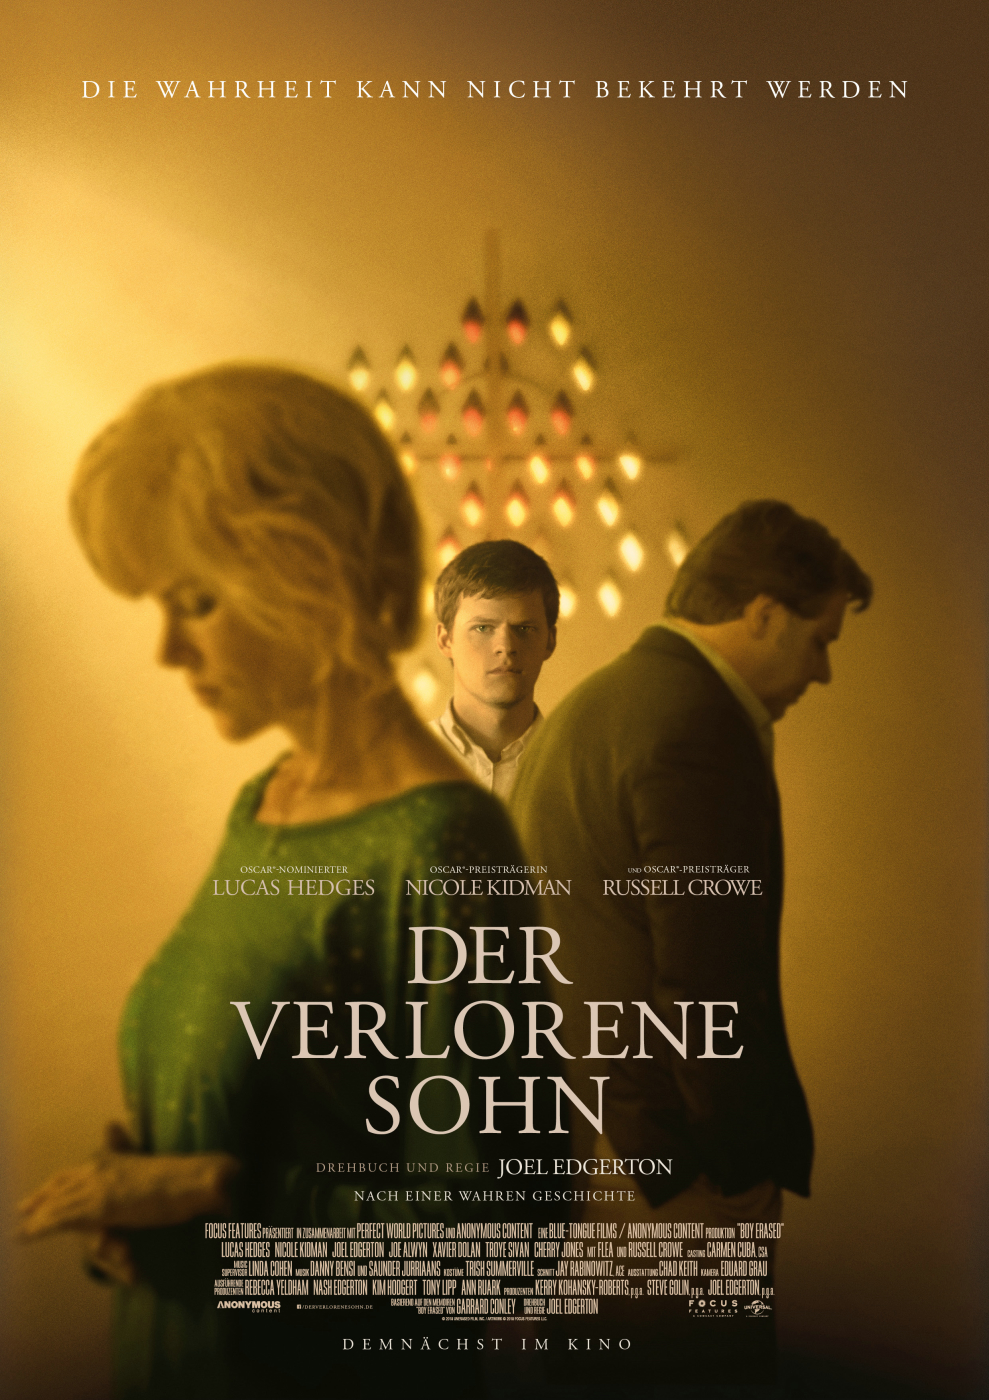 Der Verlorene Sohn Film